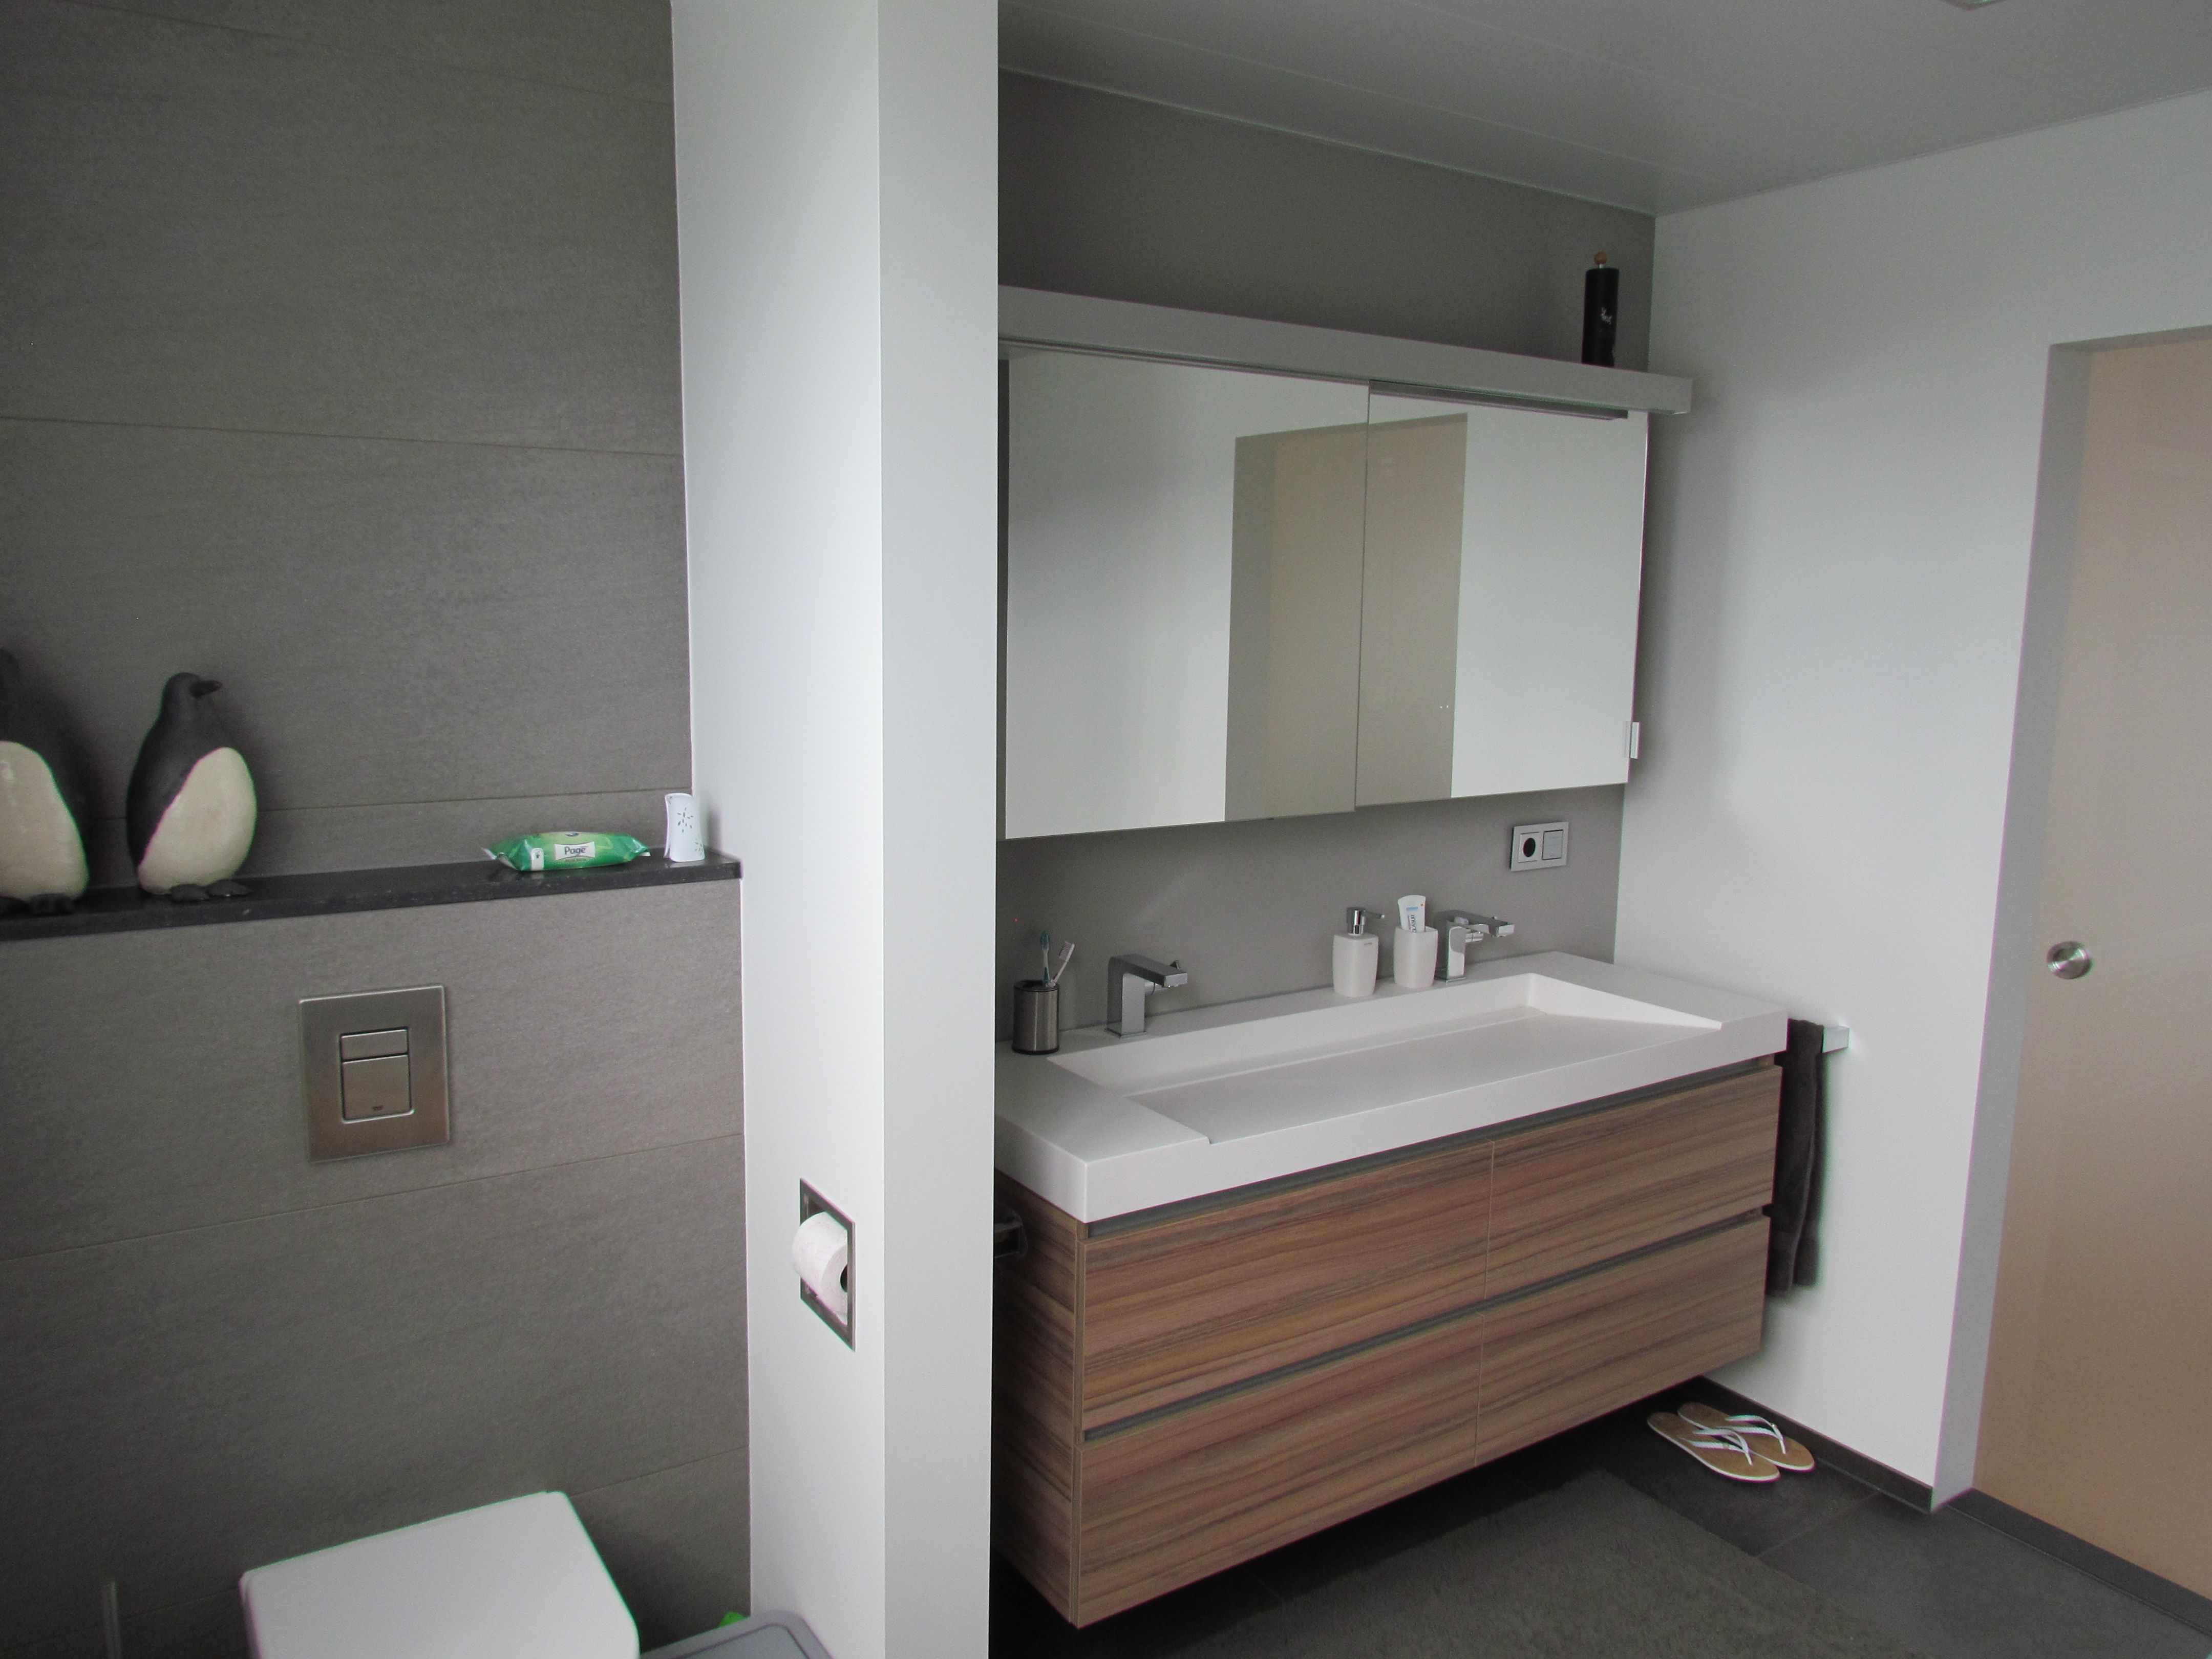 Inloopdouche Met Baderie : Modern bathroom grey white walk in shower inloopdouche badkamers